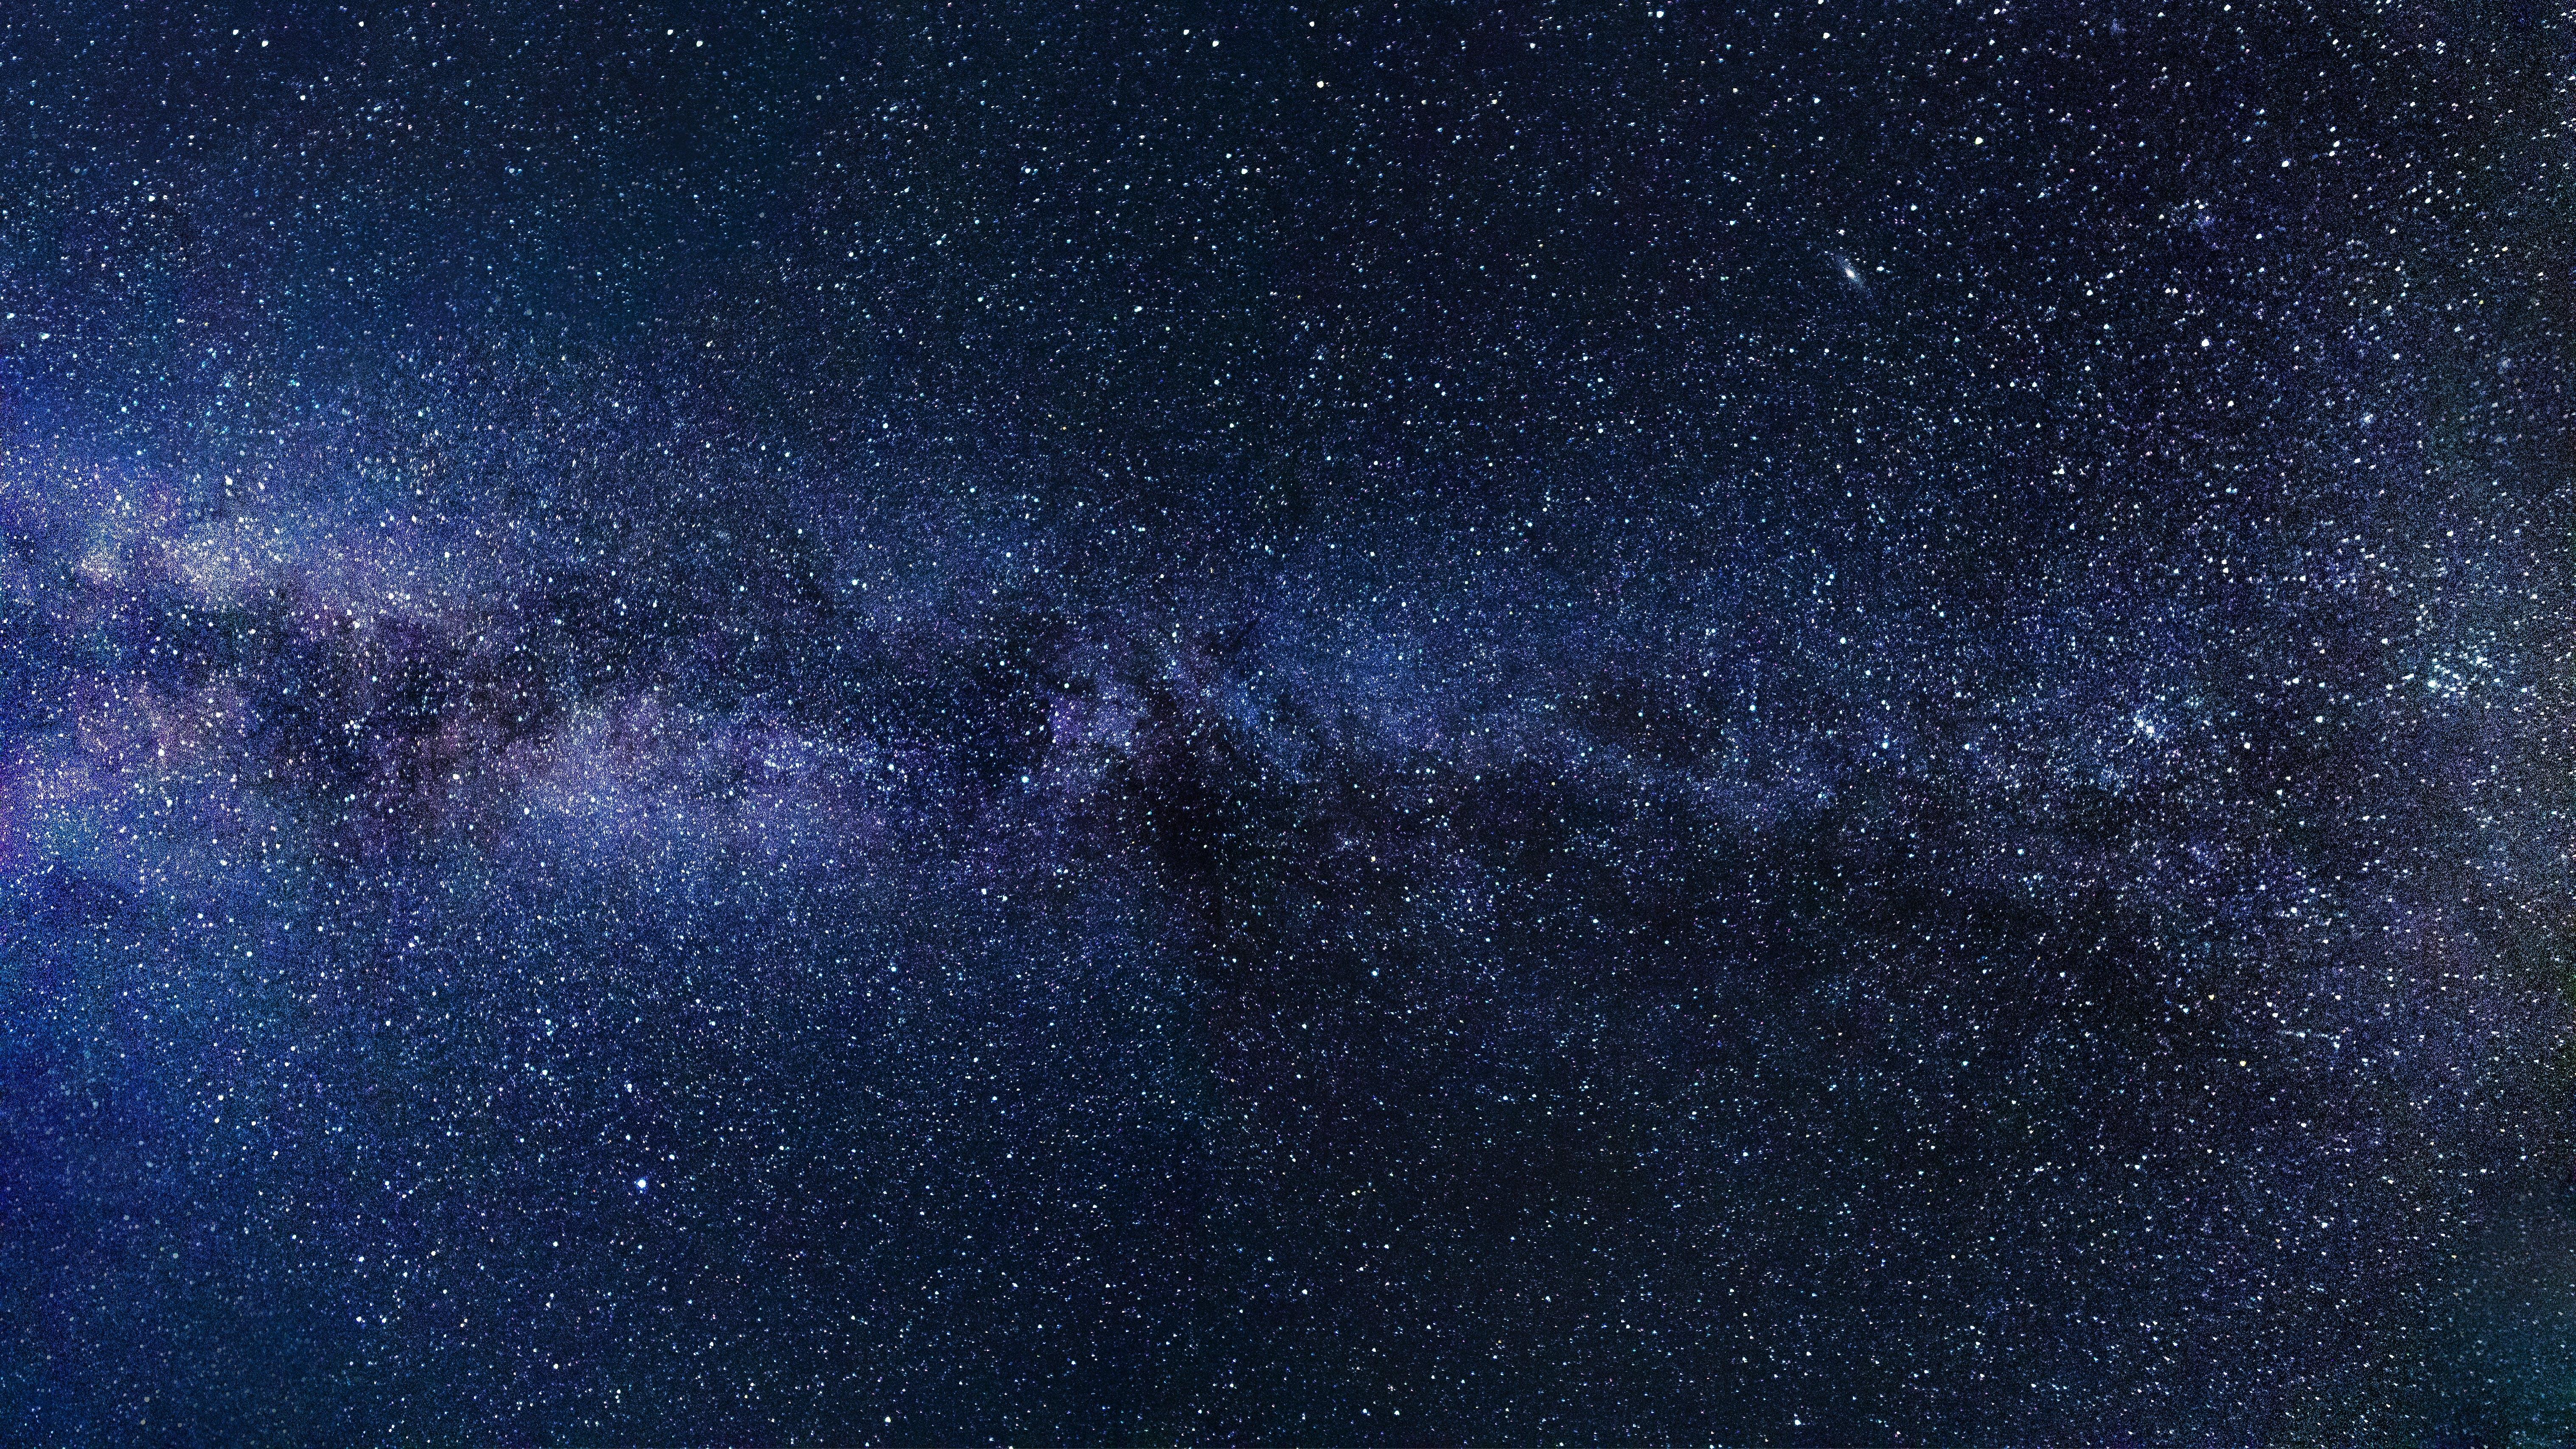 Fond D Ecran Espace Galaxie Etoiles 6070x3414 Citr3x